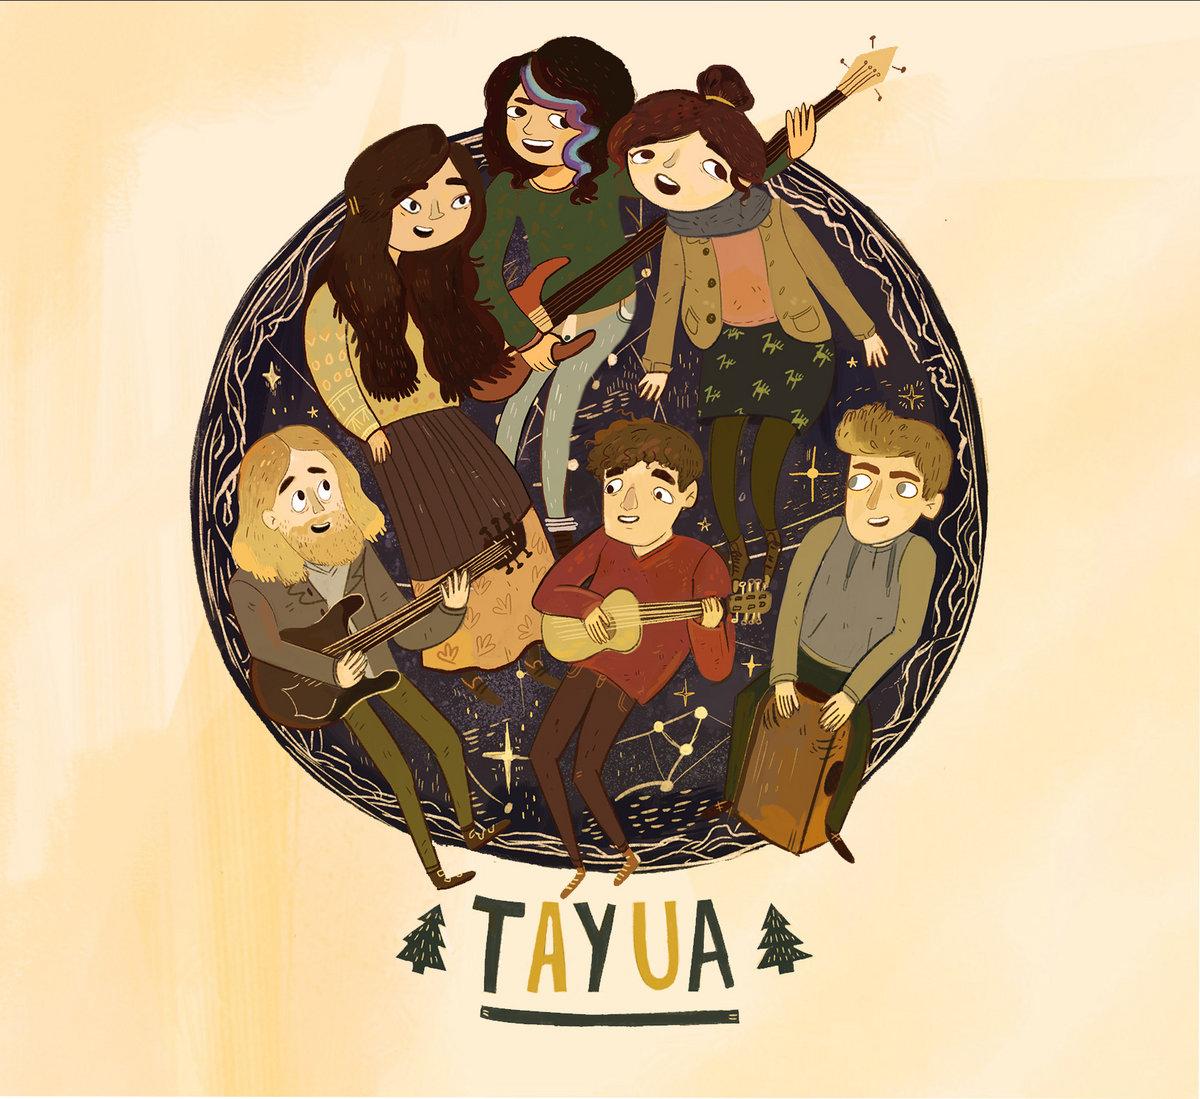 Pajarito by Tayua